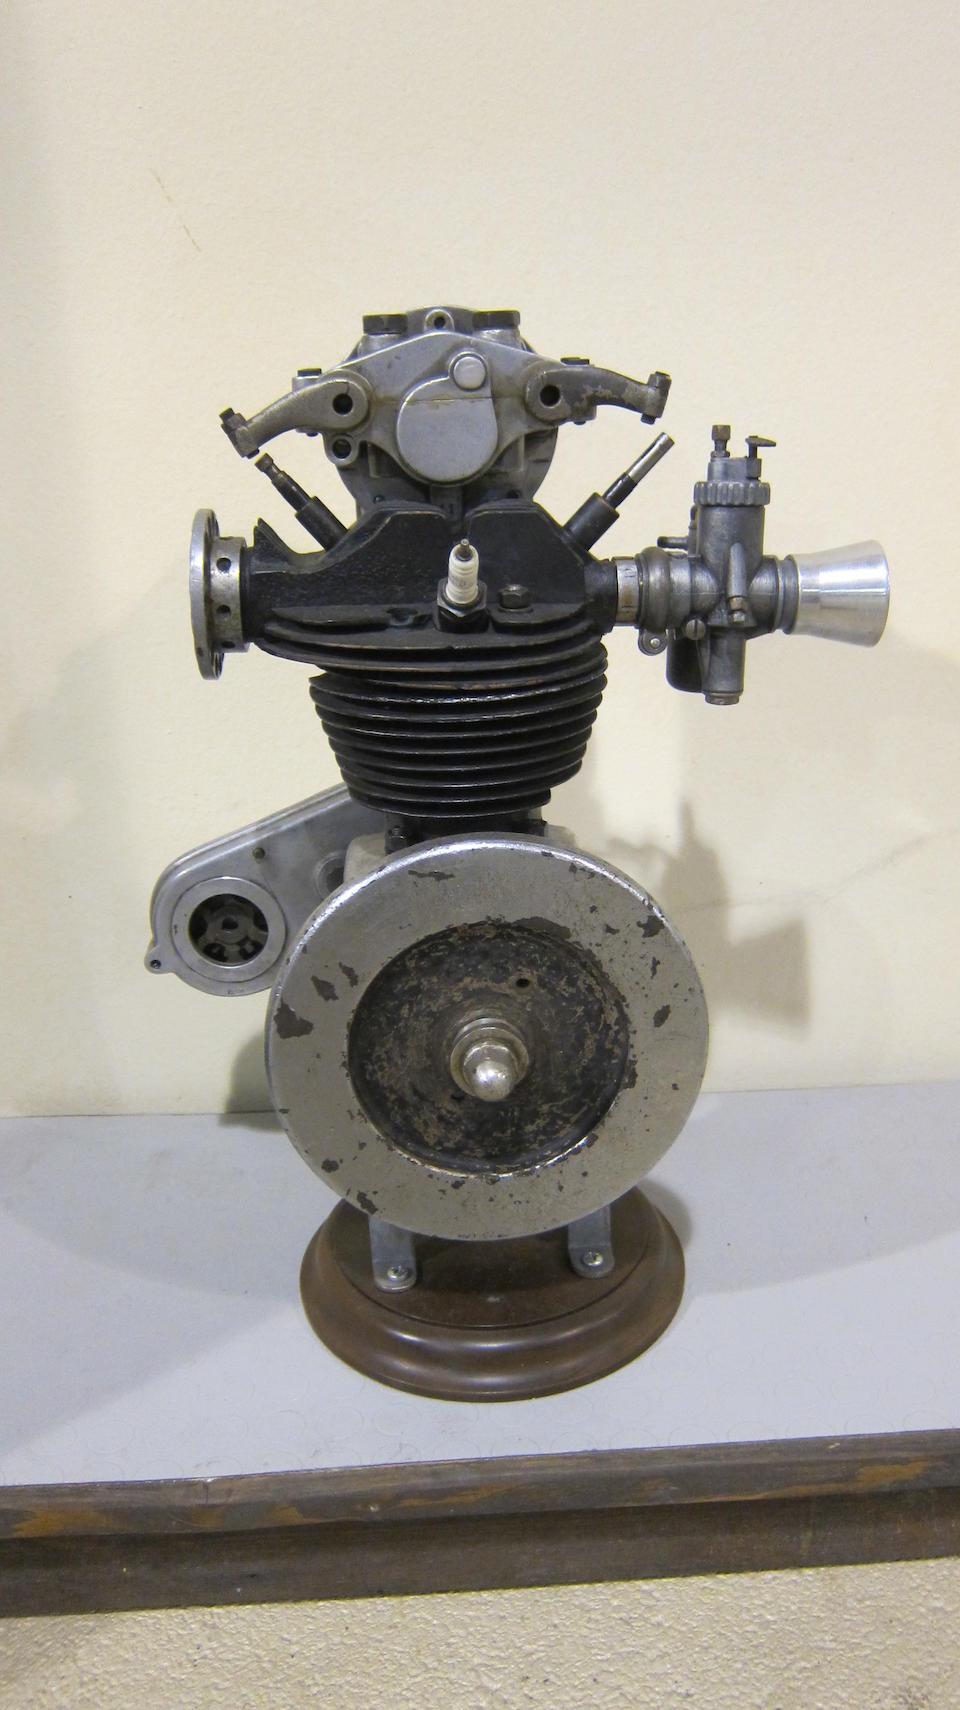 An unidentified Four-stroke OHC engine